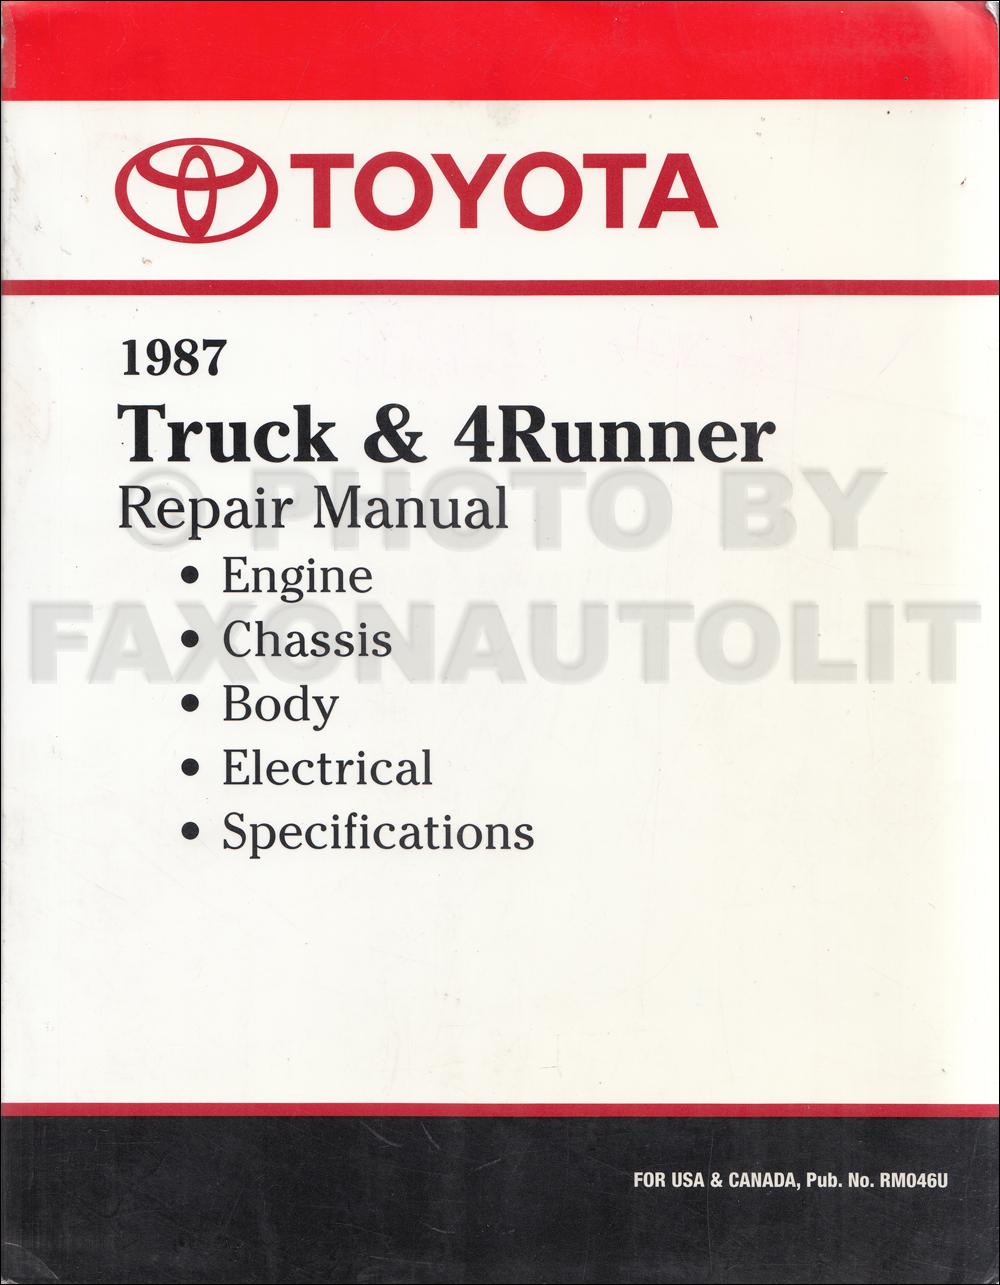 1987 Toyota 4runner Factory Service Manual Truck Wiring Diagram Pickup And Repair Shop Reprint Rh Faxonautoliterature Com 2005